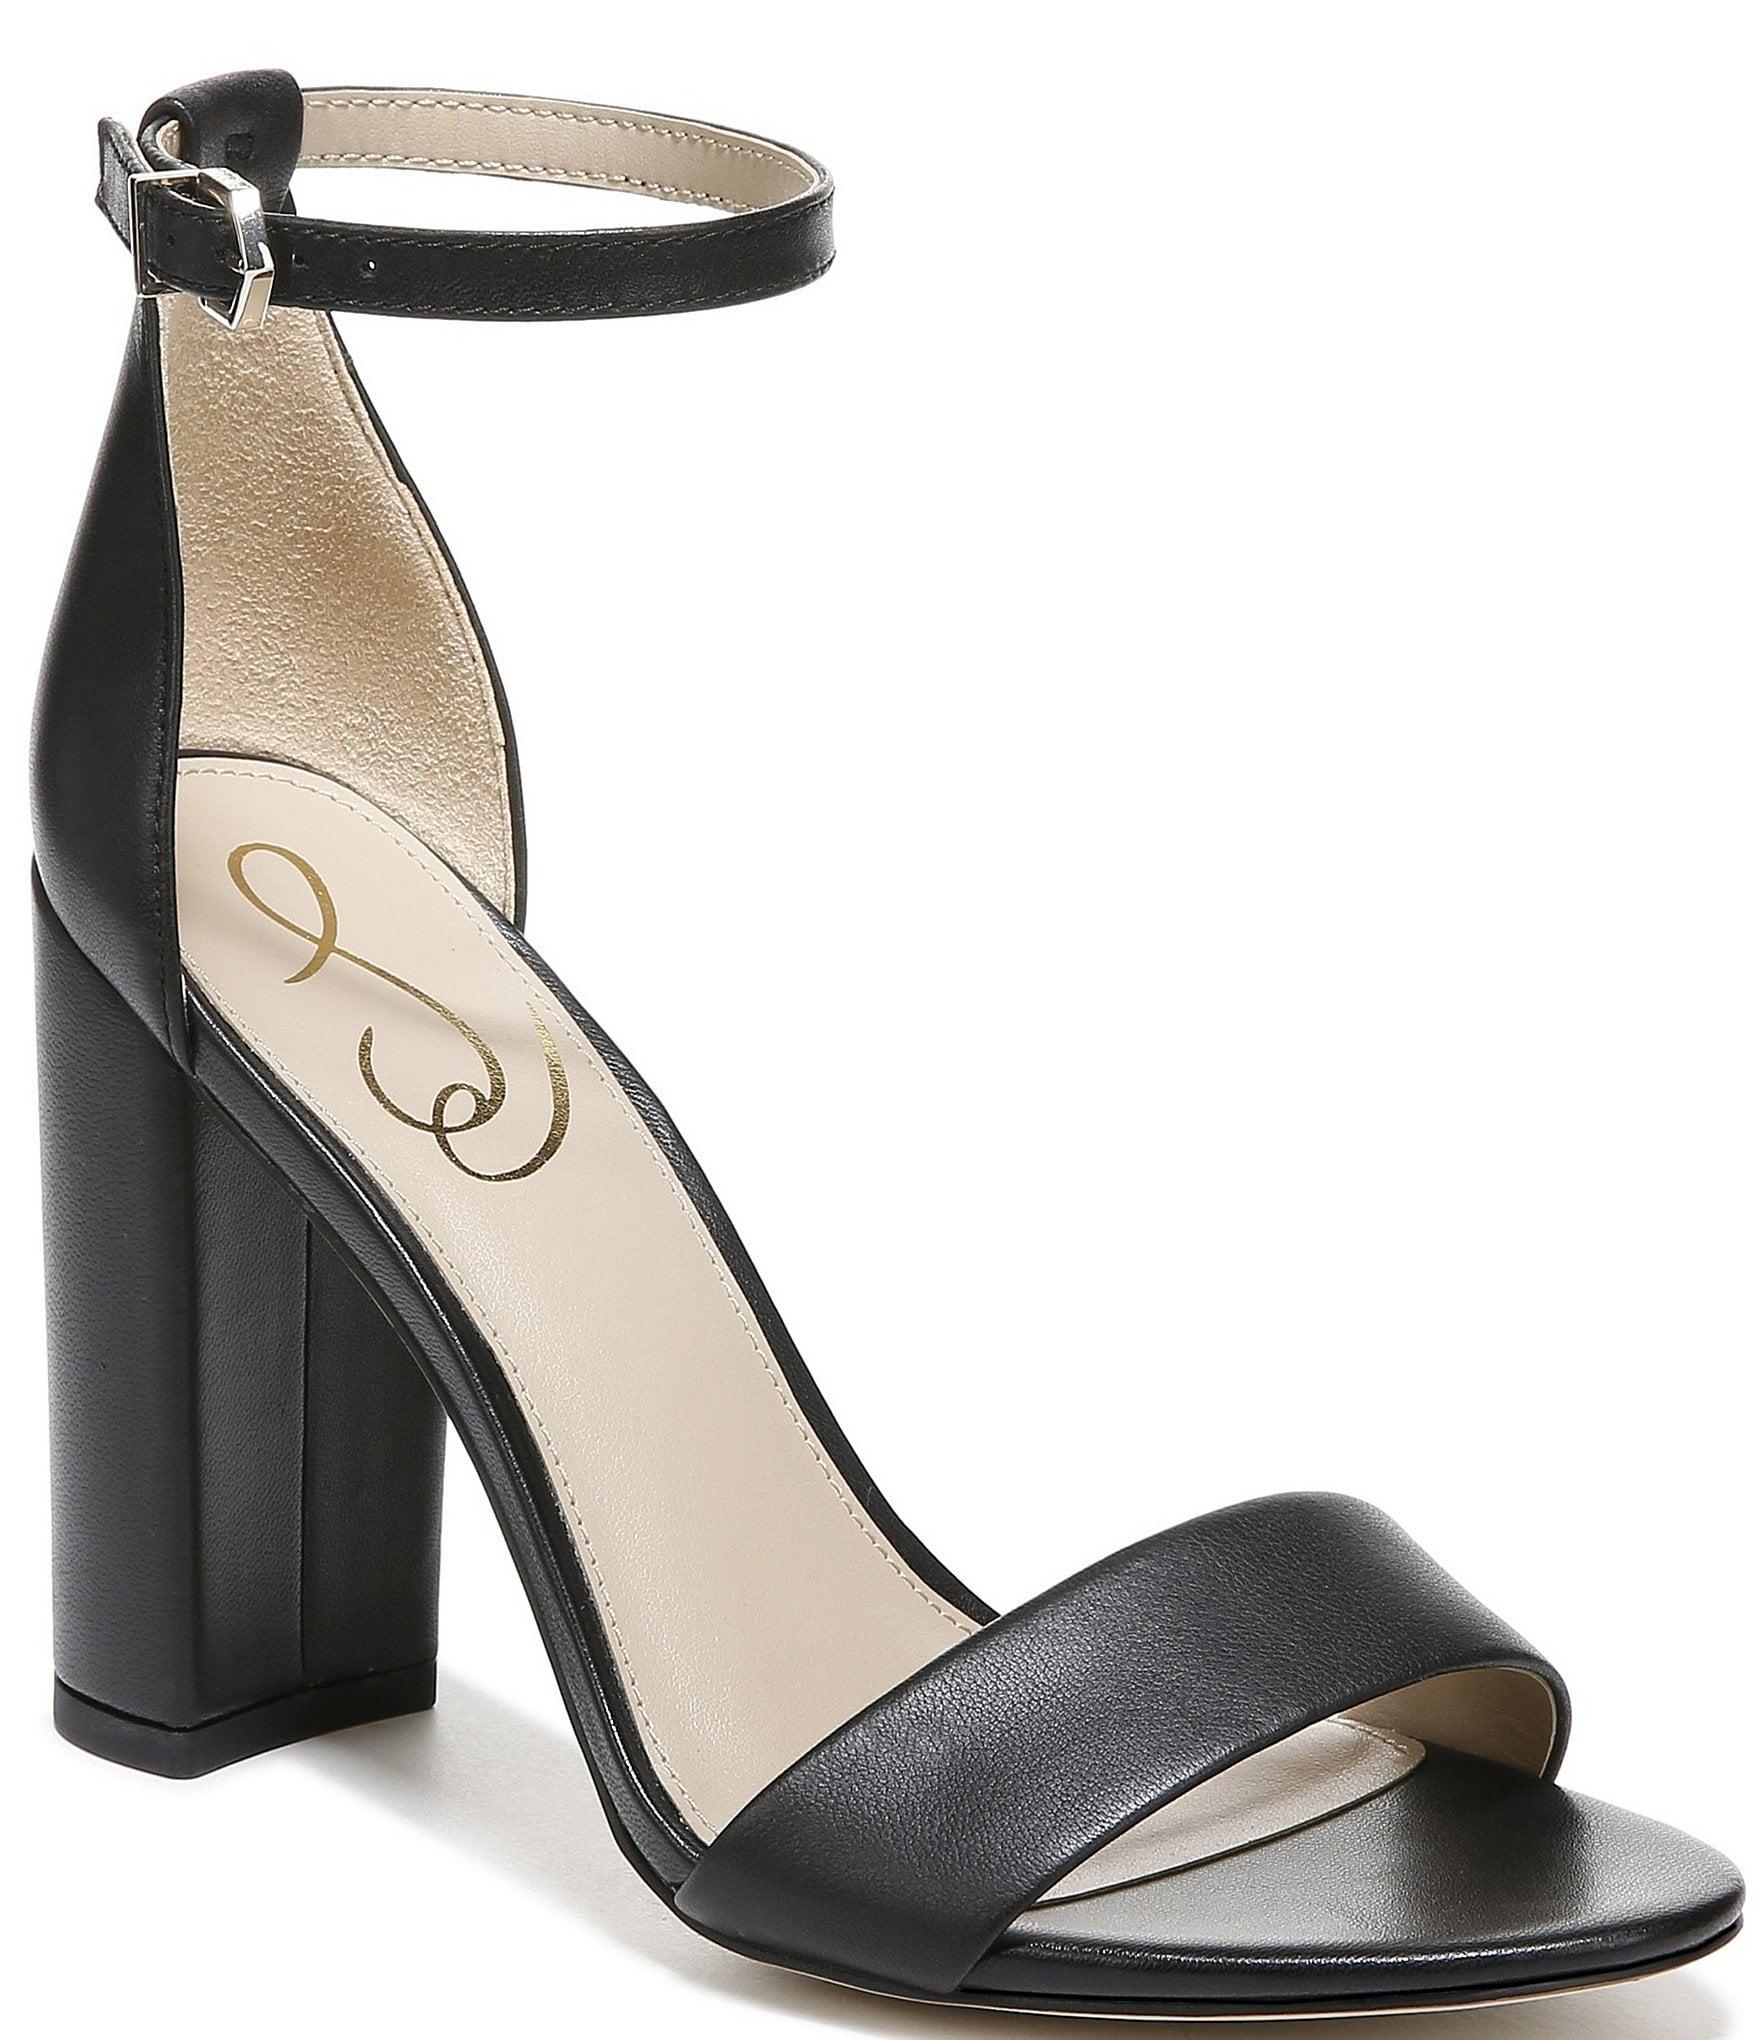 Sam Edelman Yaro Leather Ankle Strap Block Heel Dress